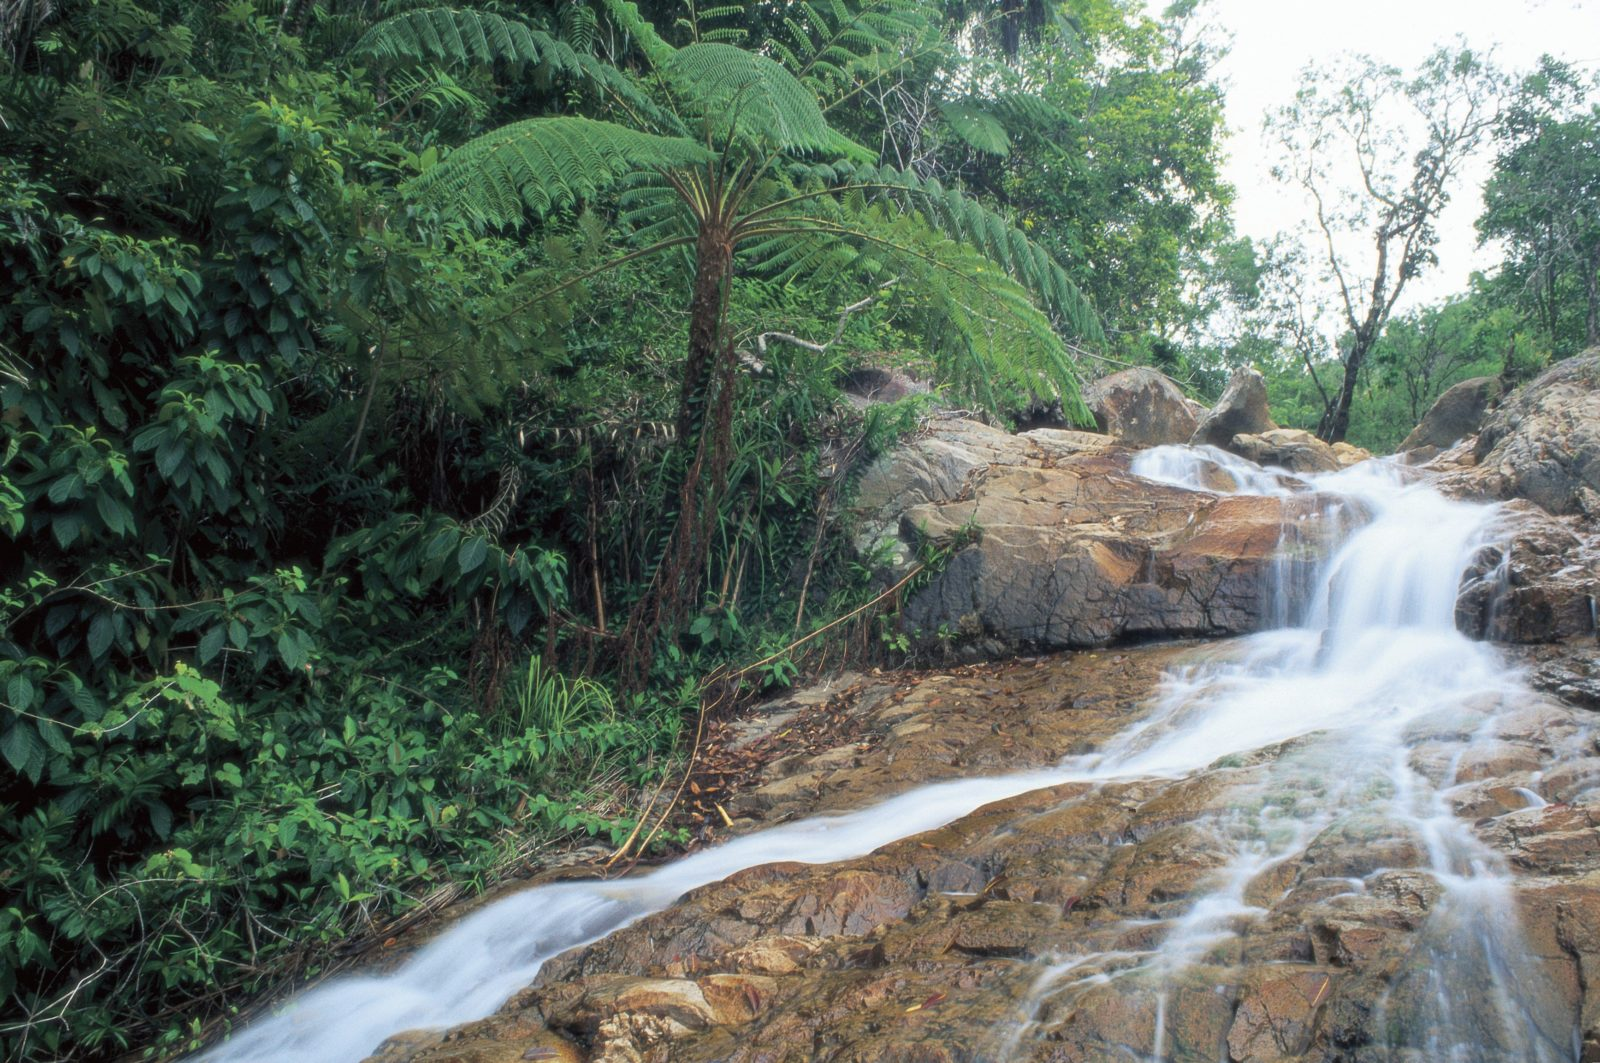 Finch Hatton Gorge Waterfall